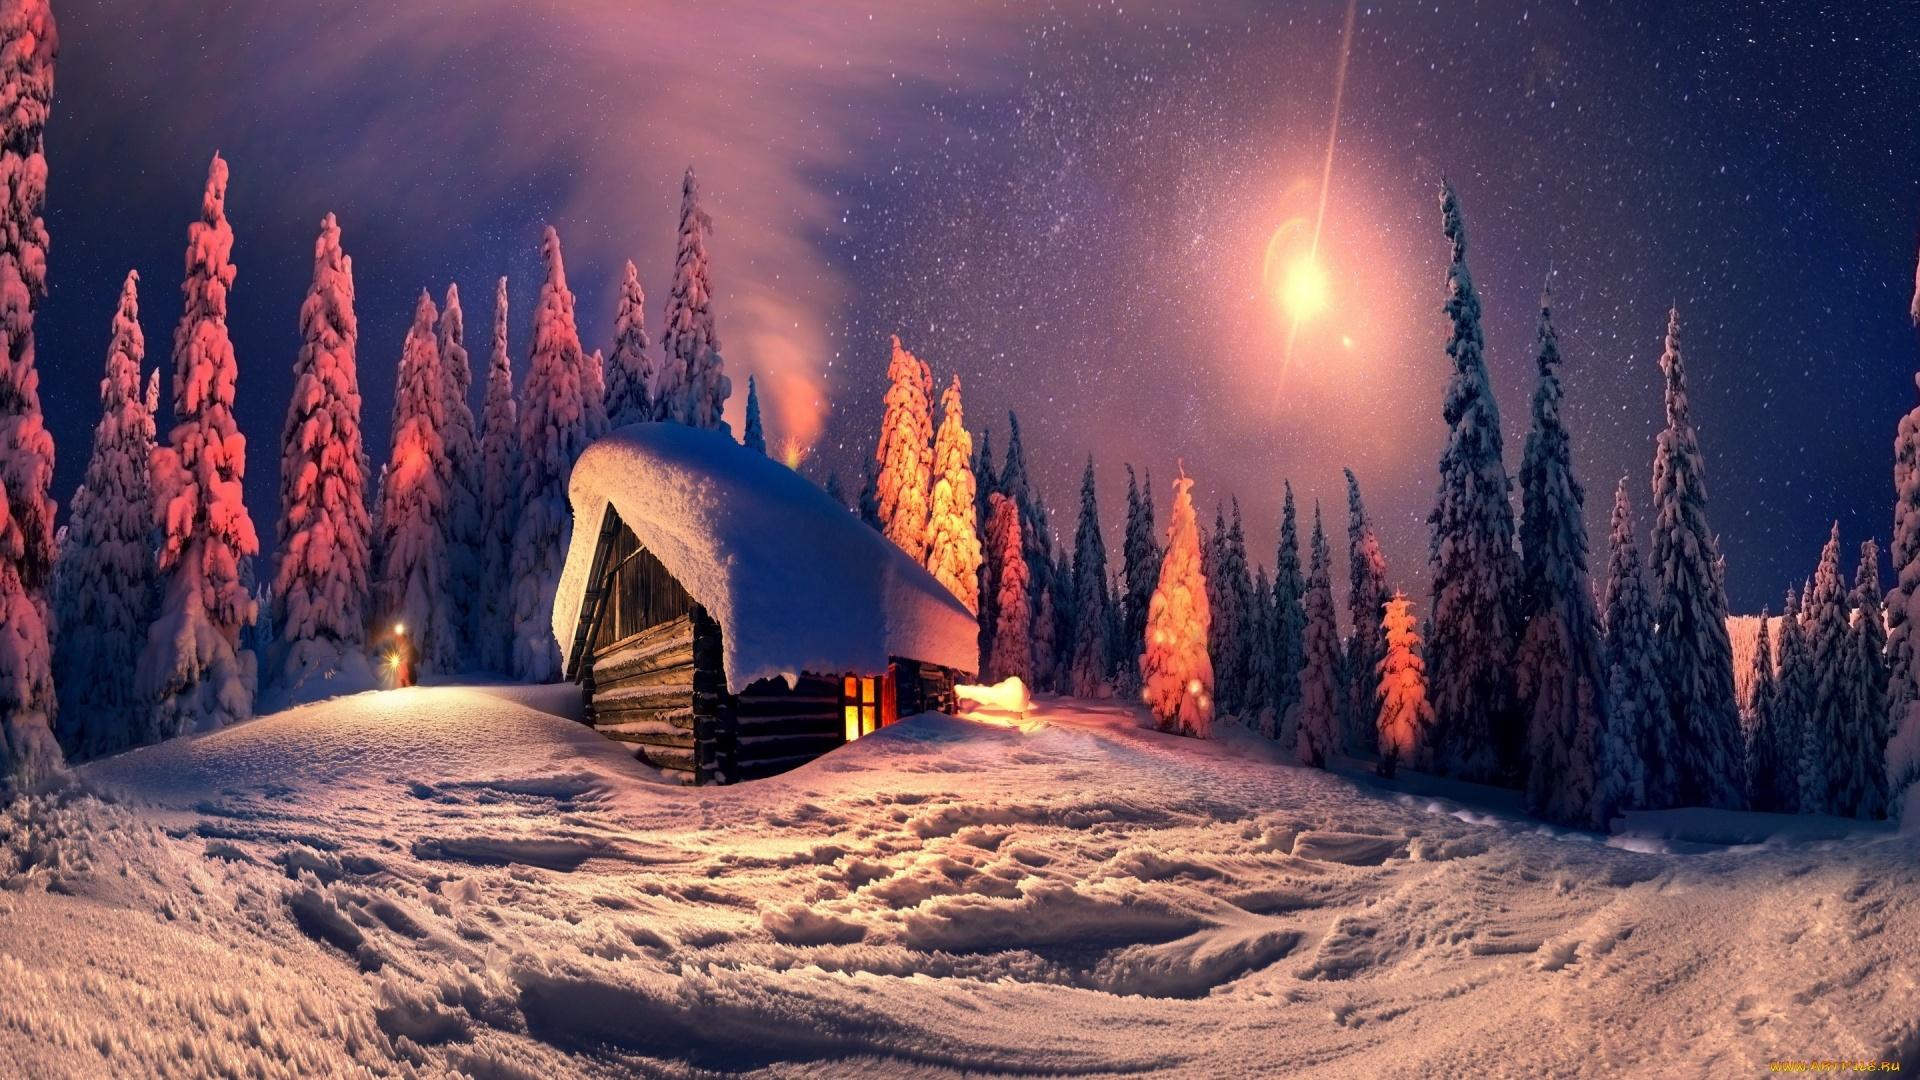 Winter New Year's Evening HD Wallpaper